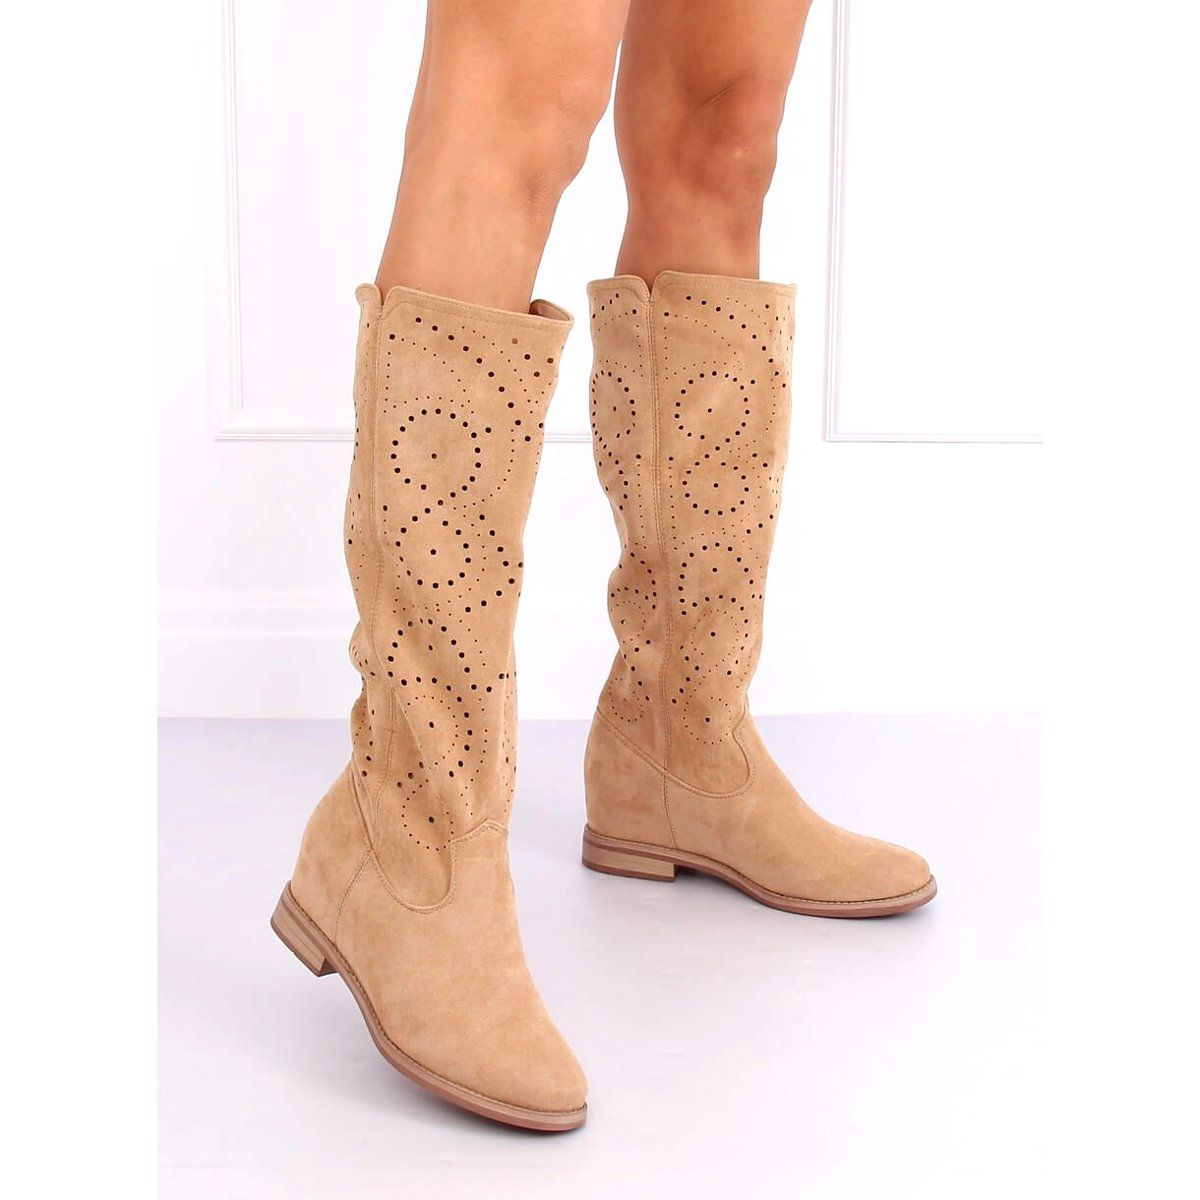 Kozaki Azurowe Na Koturnie Bezowe Nc1015 Beige Bezowy Boots Shoes Ankle Boot